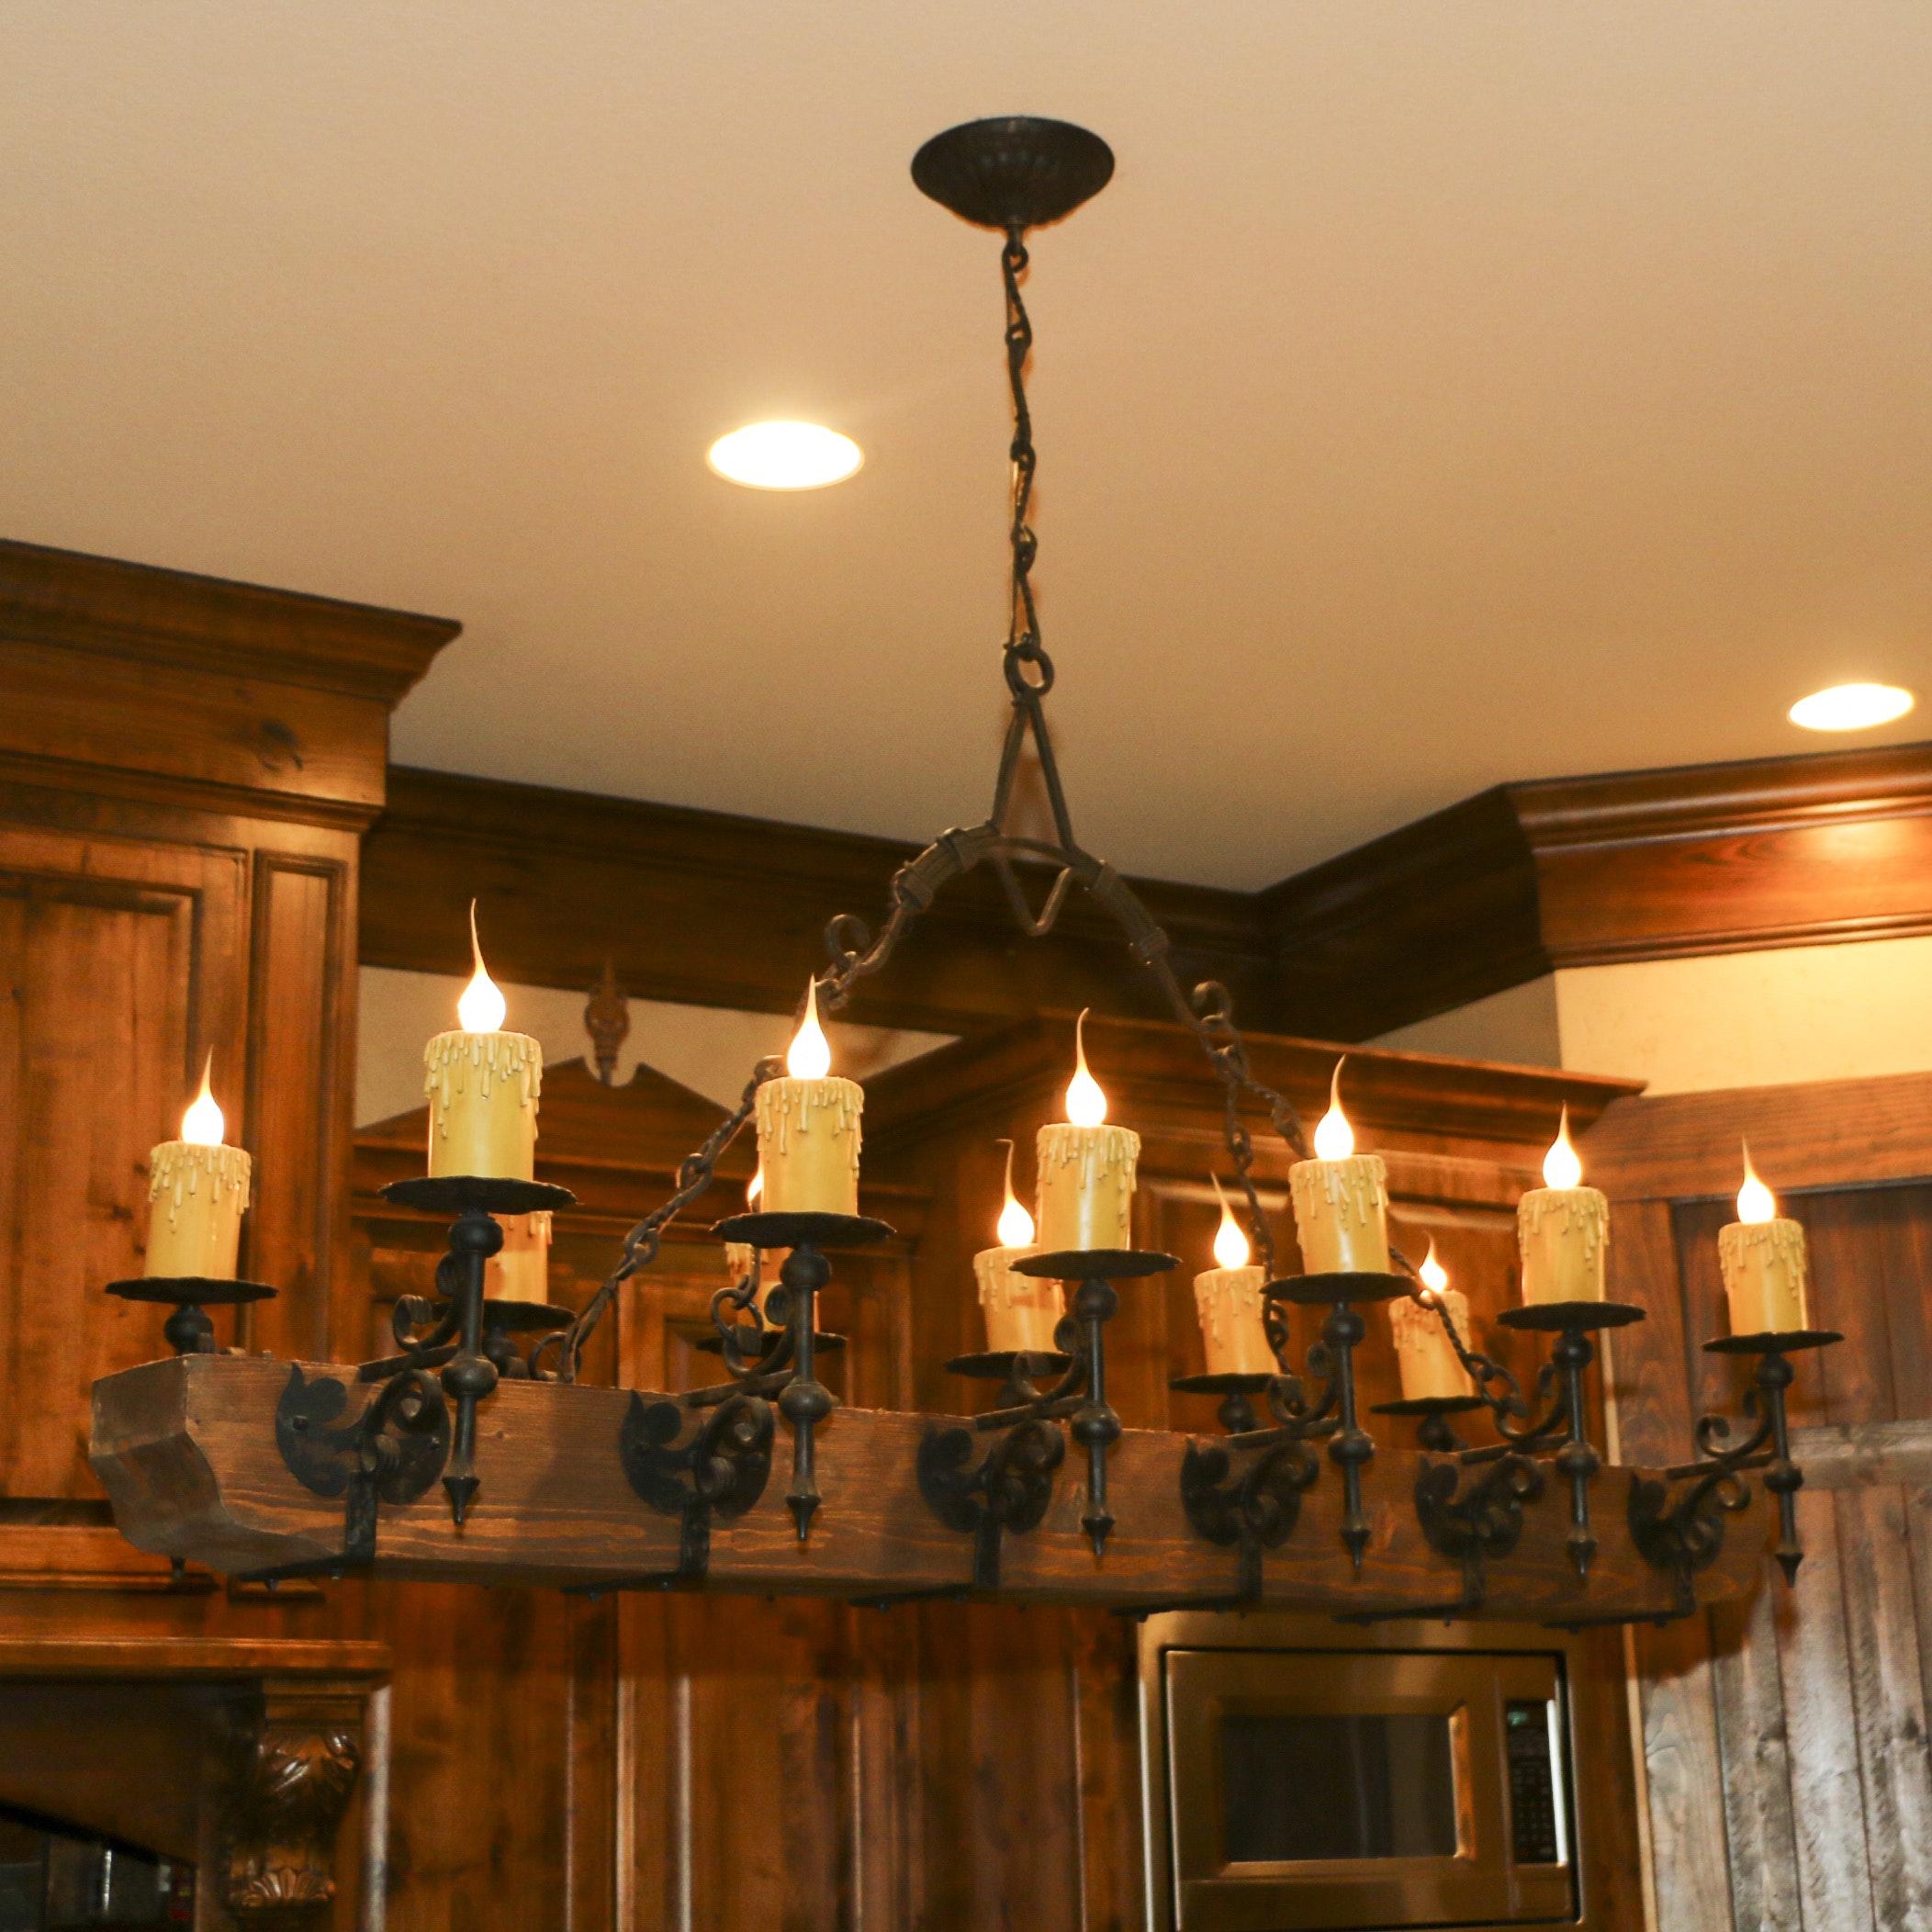 Gothic Style Wooden Beam Twelve-Arm Pendant Light